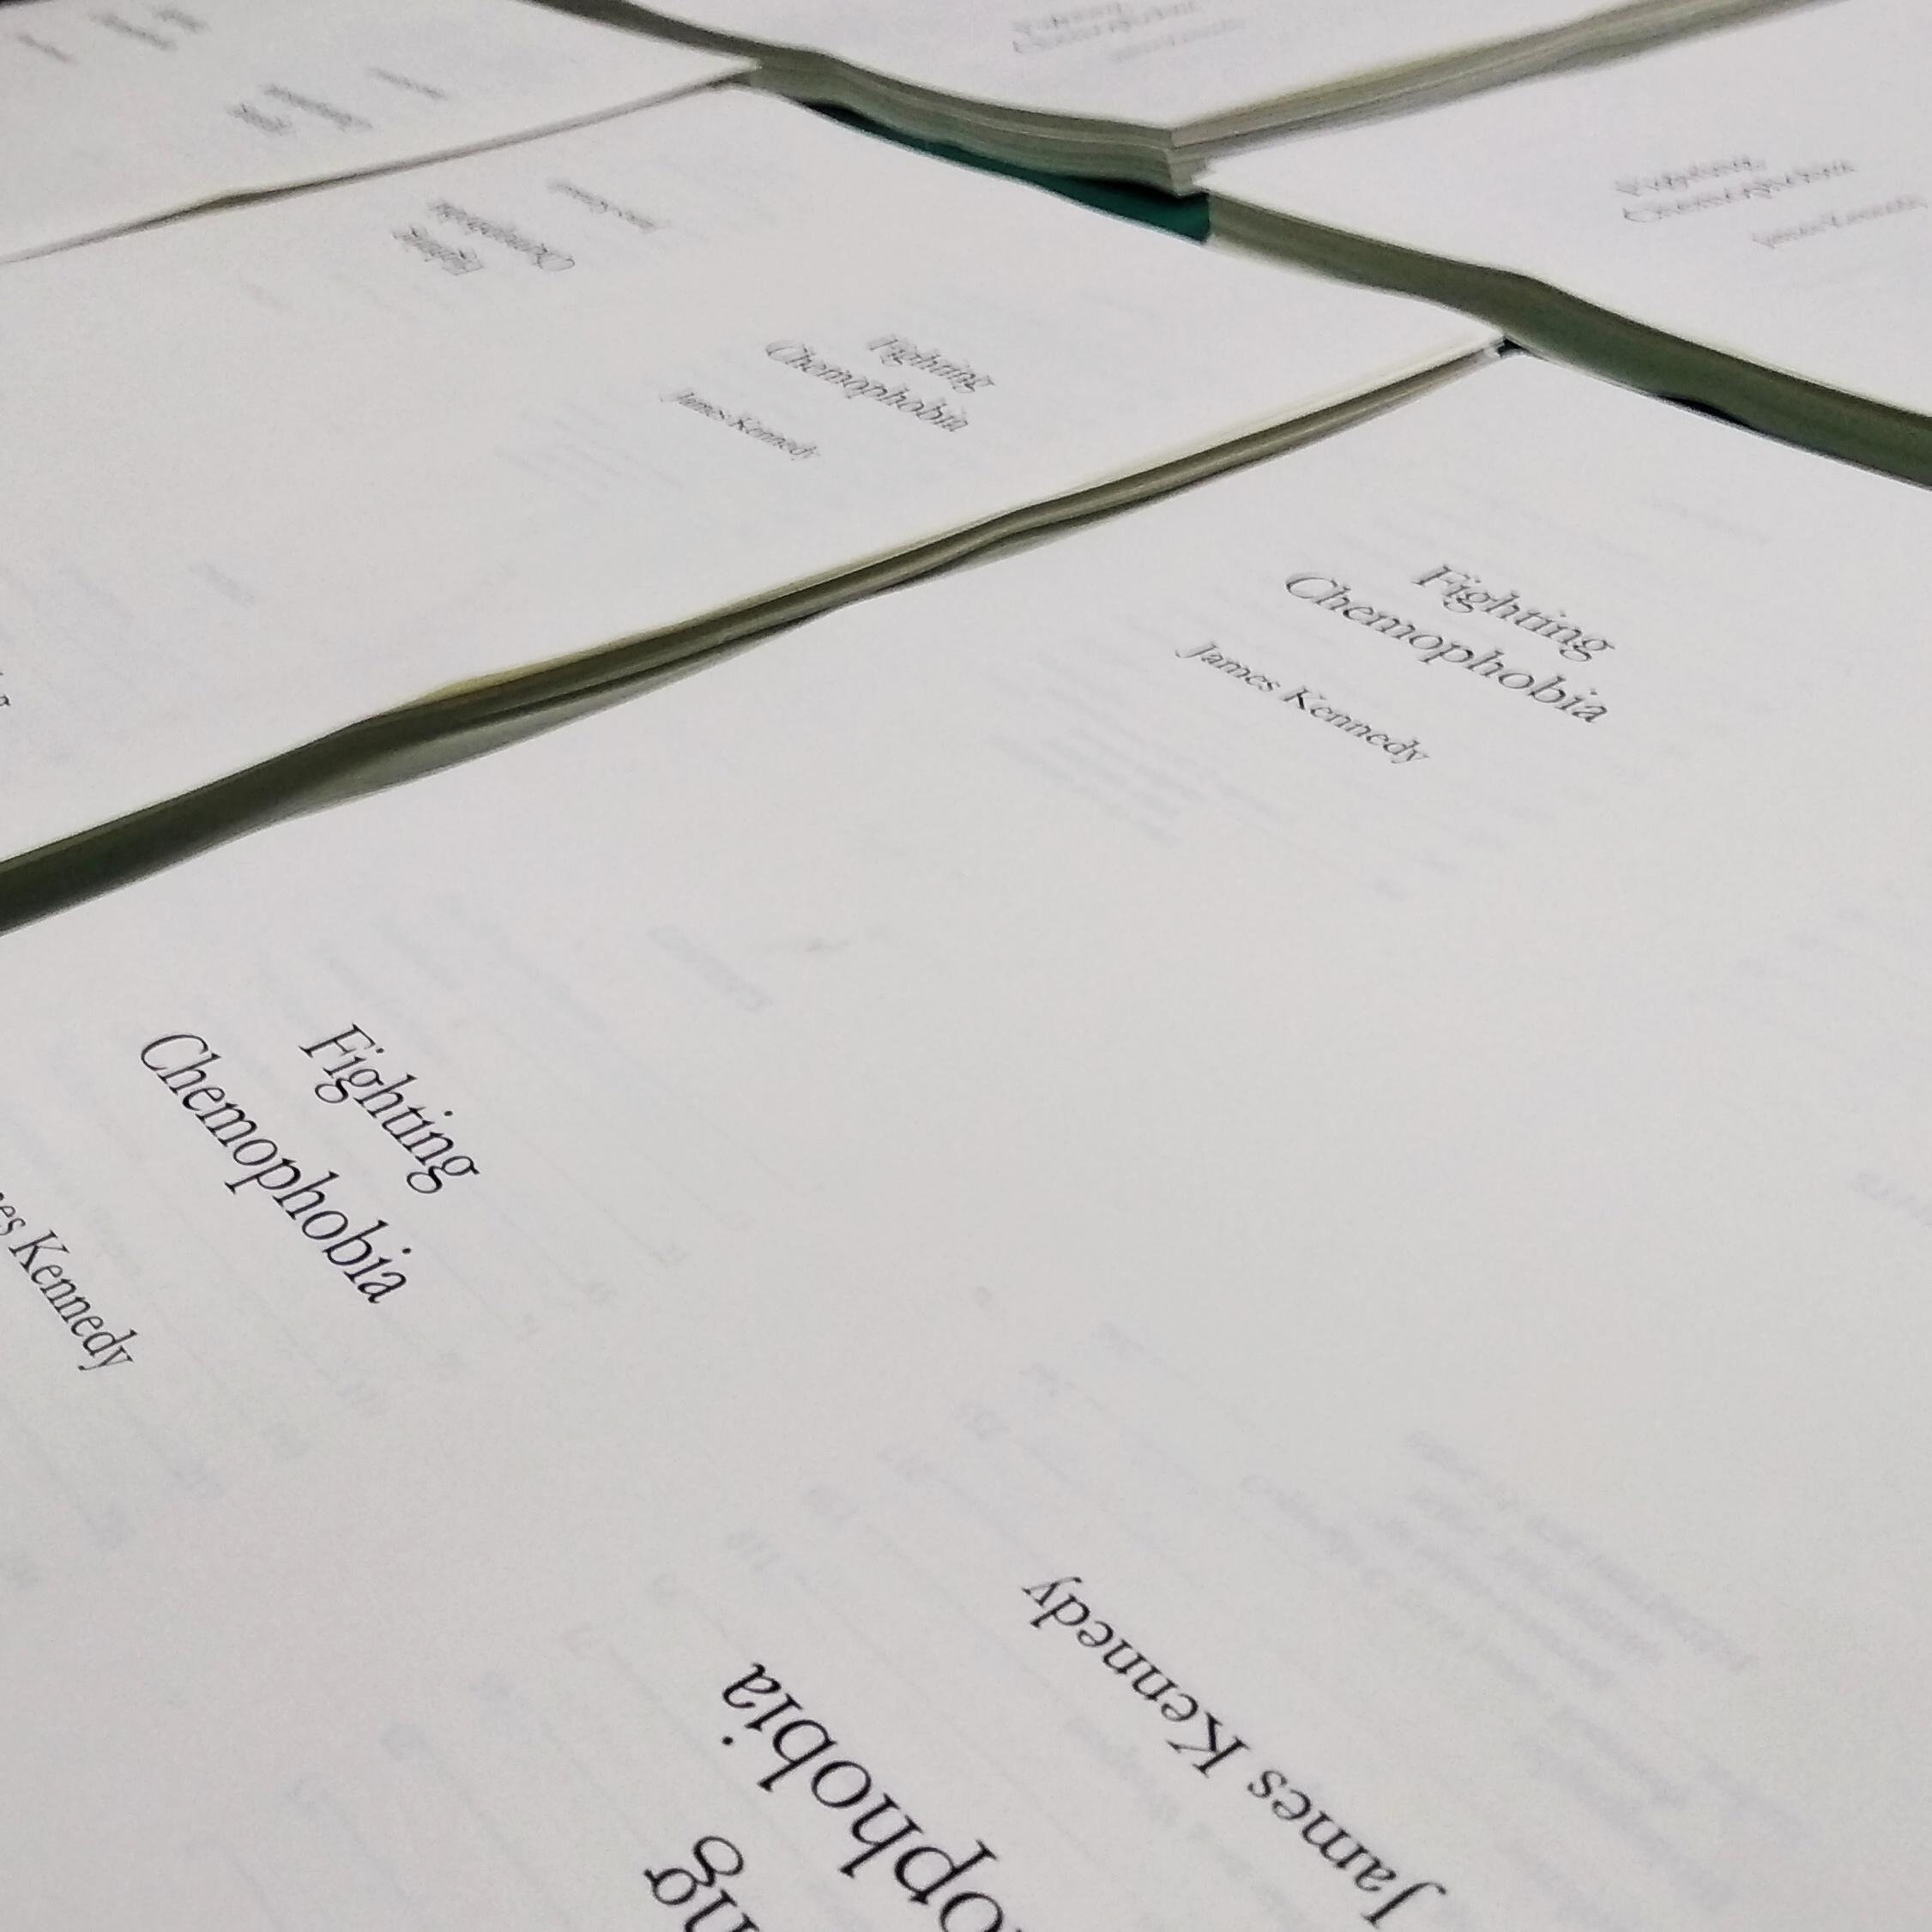 James Kennedy  Vce Chemistry Teacher In Melbourne Australia Fighting Chemophobia Printed Sheets